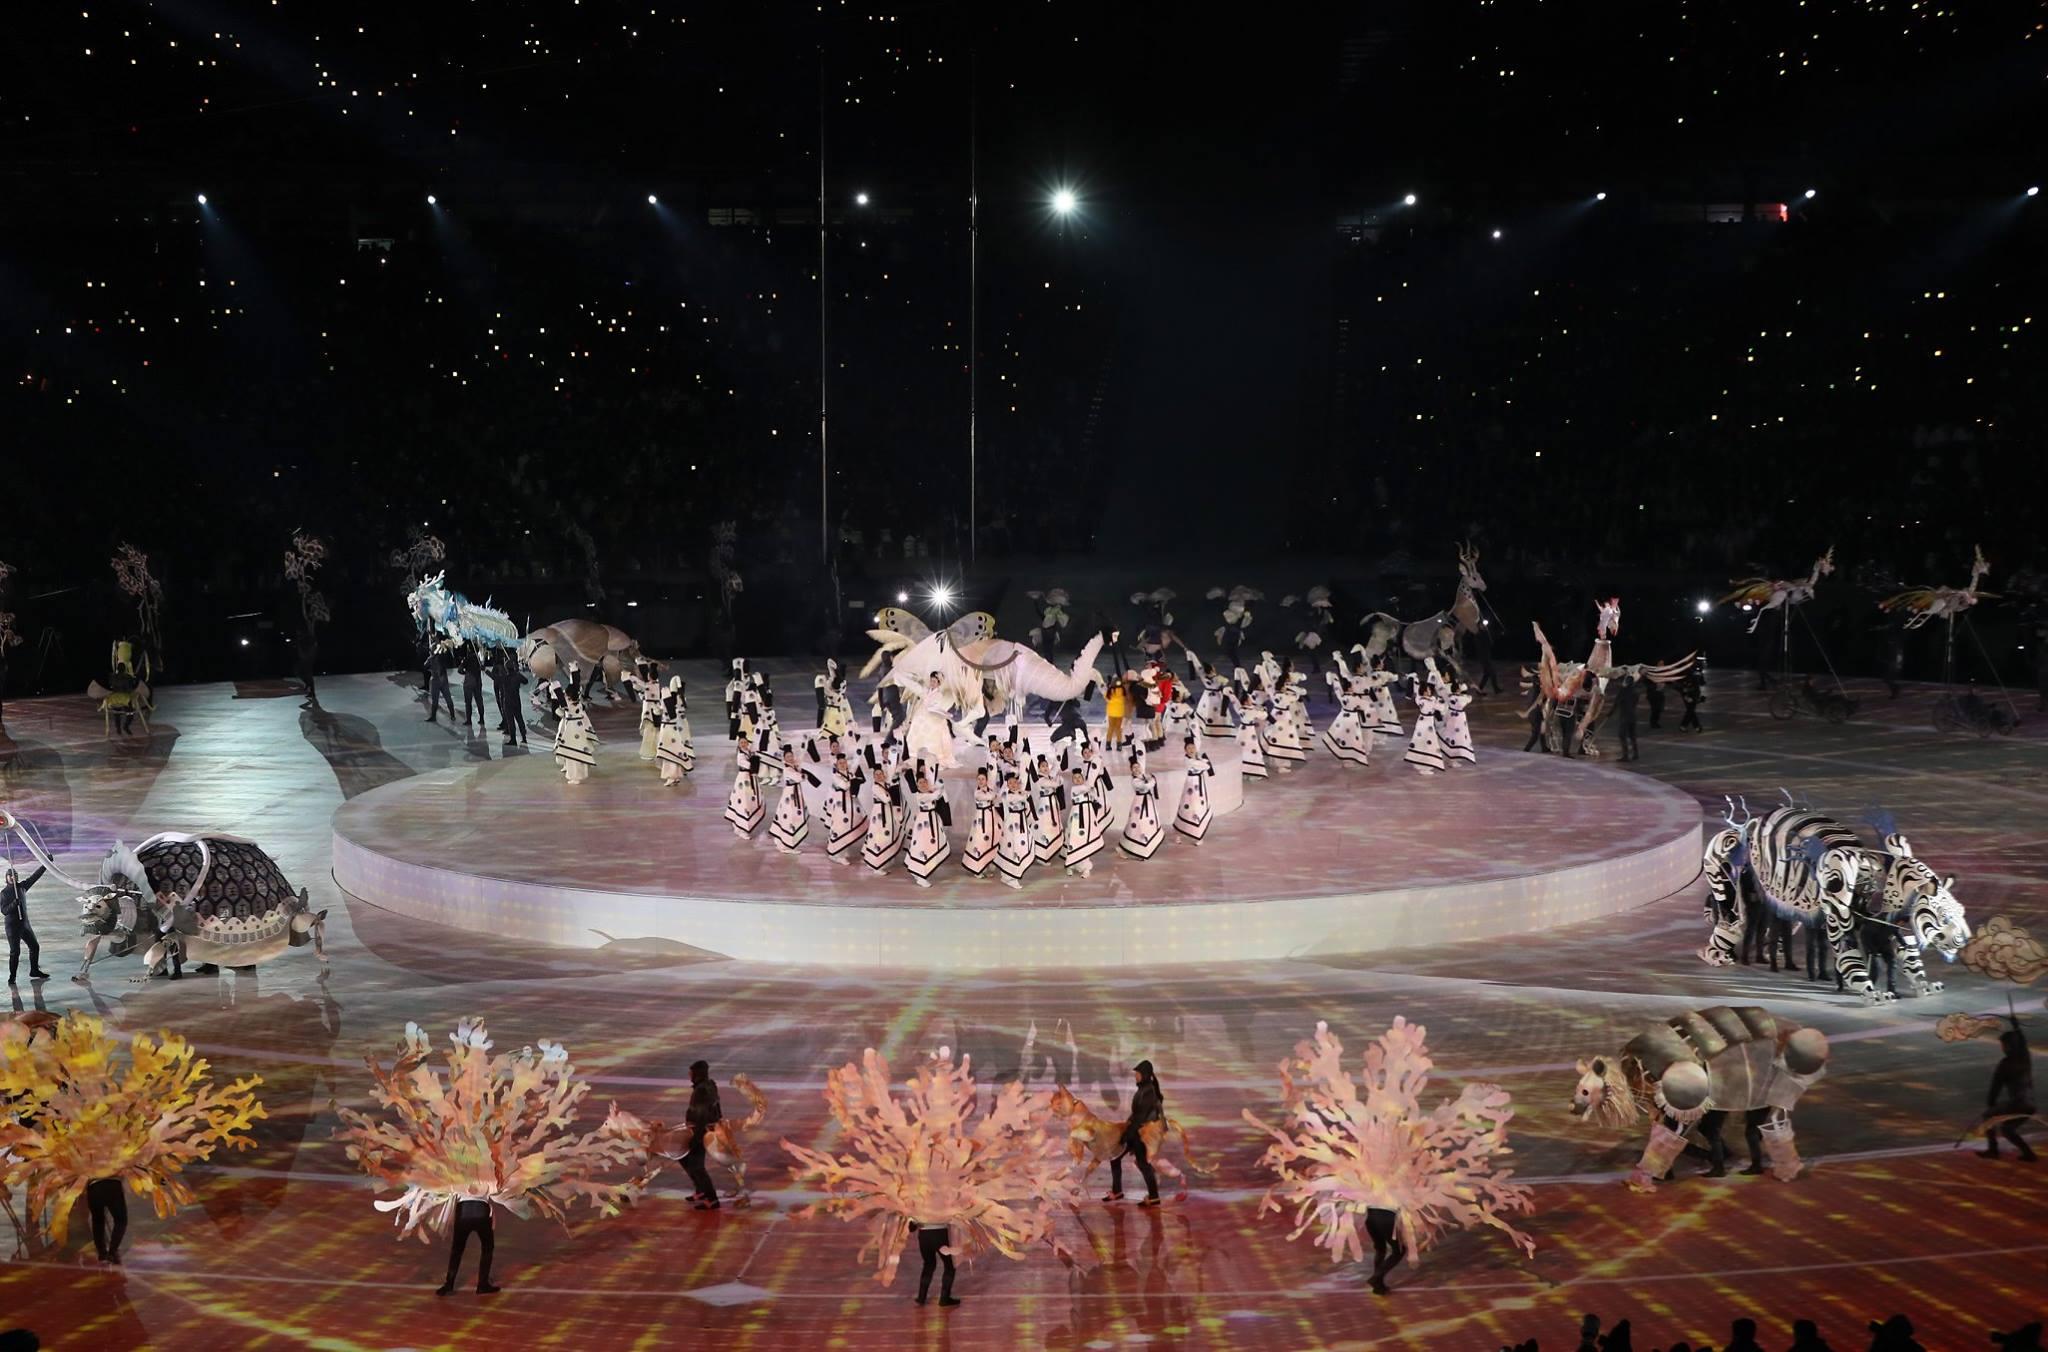 Pyeongchang 2018 Opening Ceremony